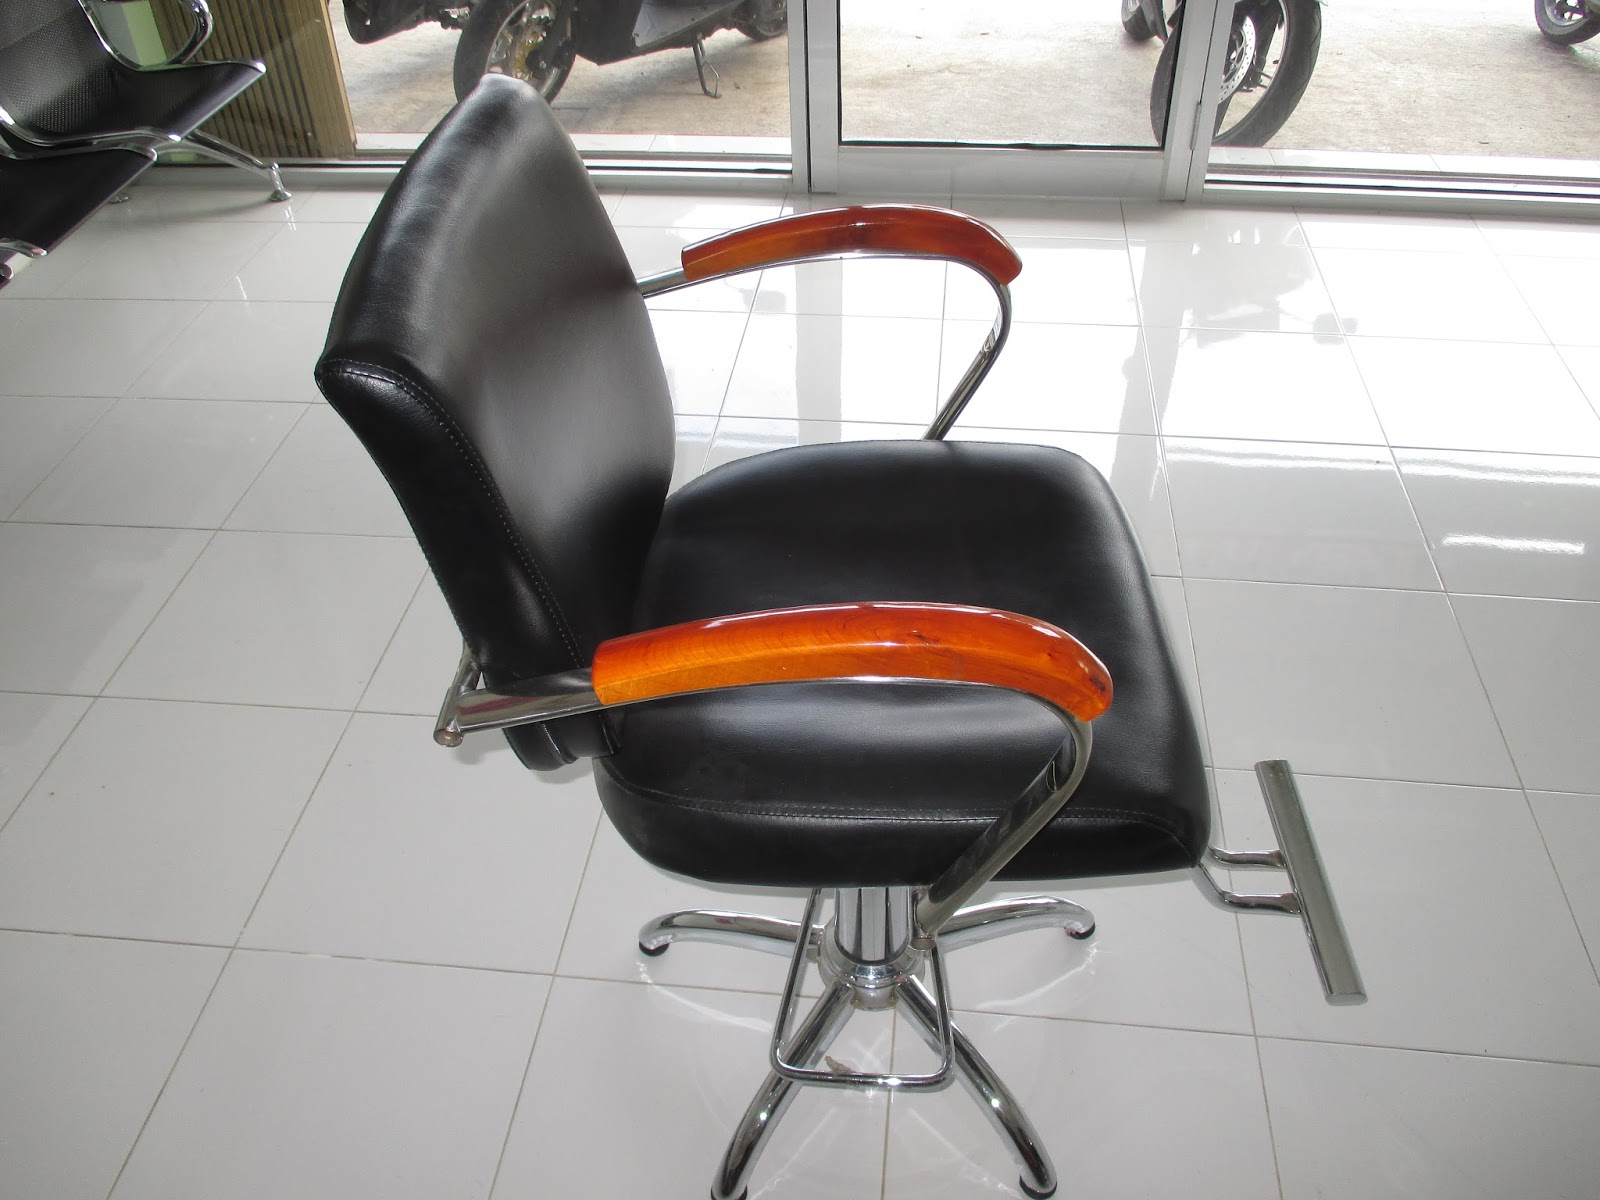 229. kursi barber hidrolik 2. LANGSUNG SIAP UNTUK MEMBUKA BARBERSHOP POTONG  RAMBUT  SALON 087739076675. Isi Paket ... 964345e582